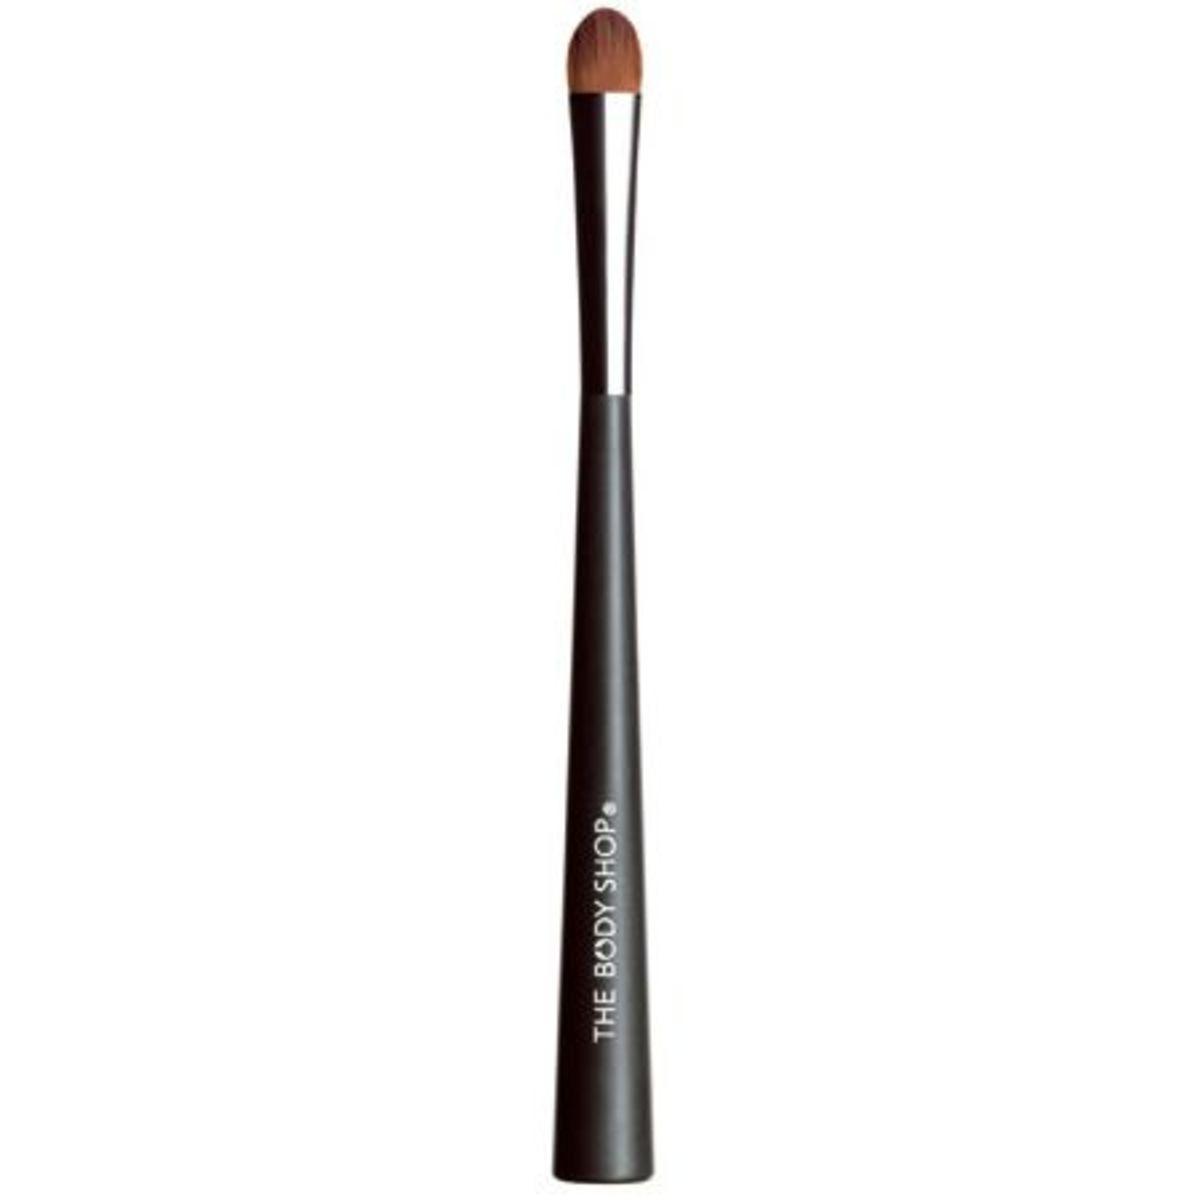 The-Body-Shop-eyeshadow-brush